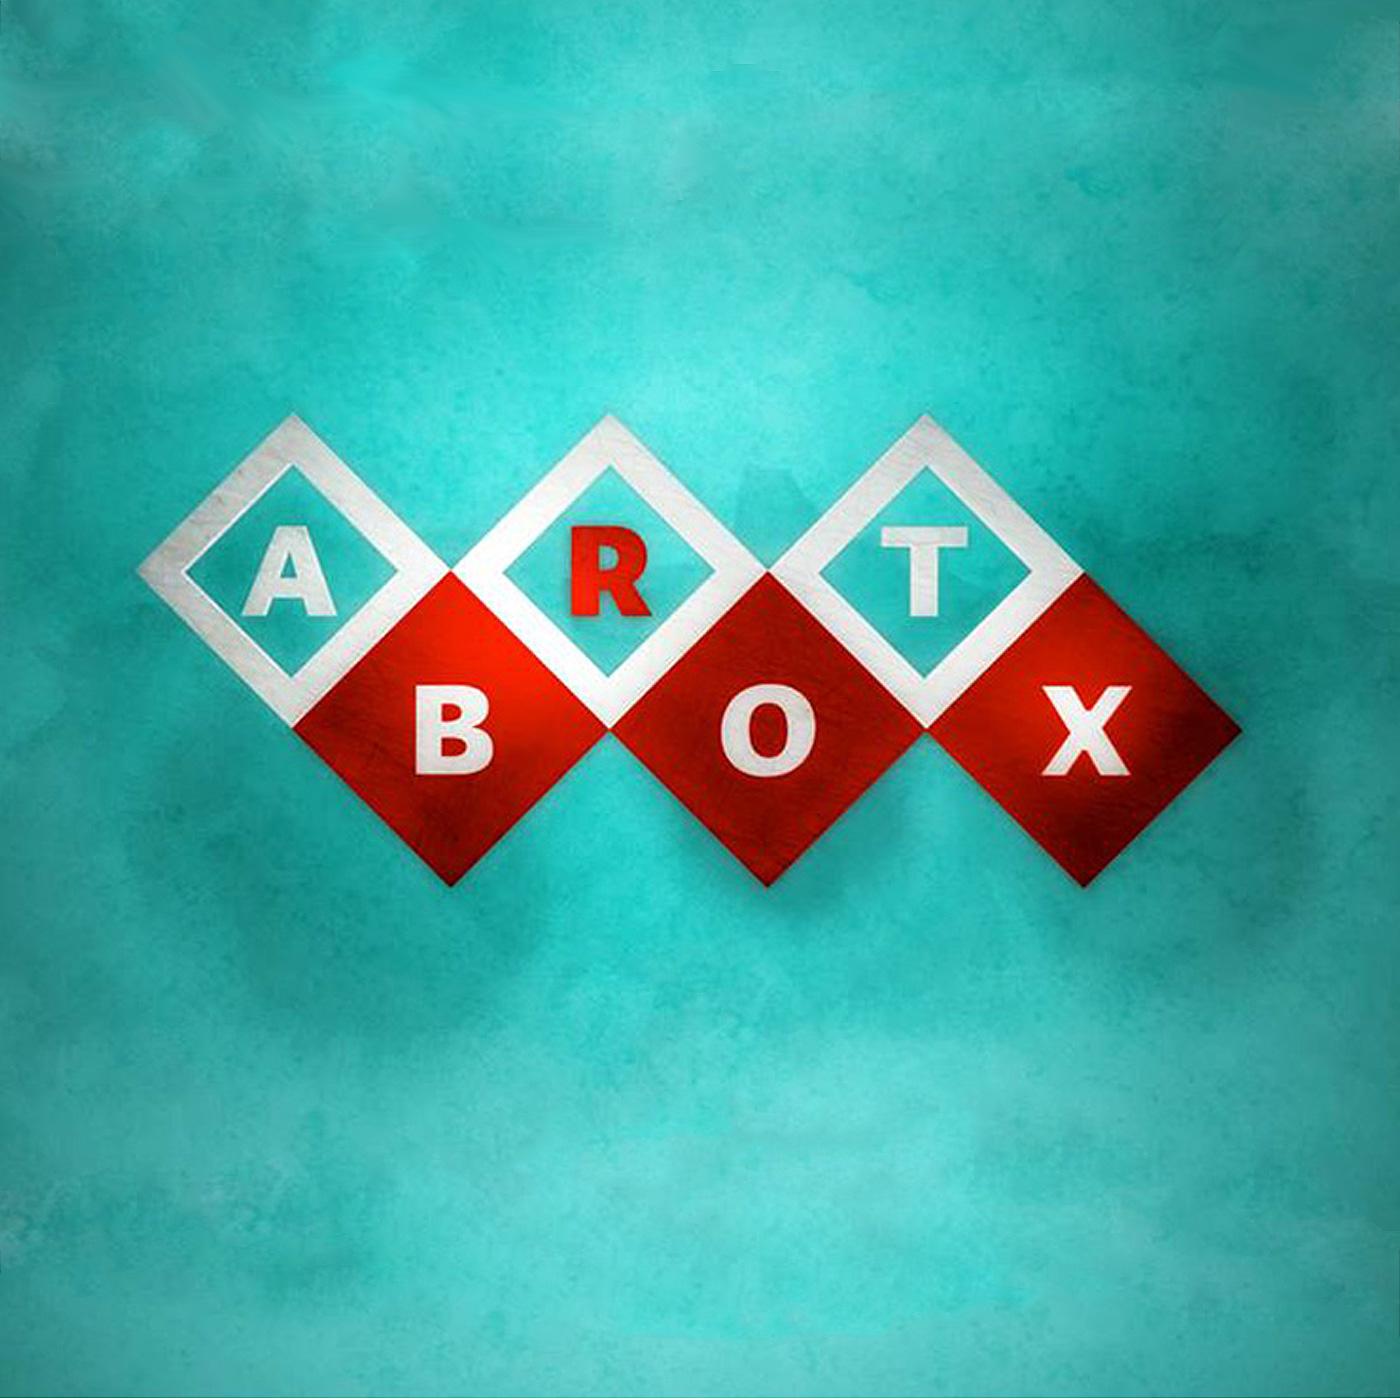 RTL - ArtBox (Large)